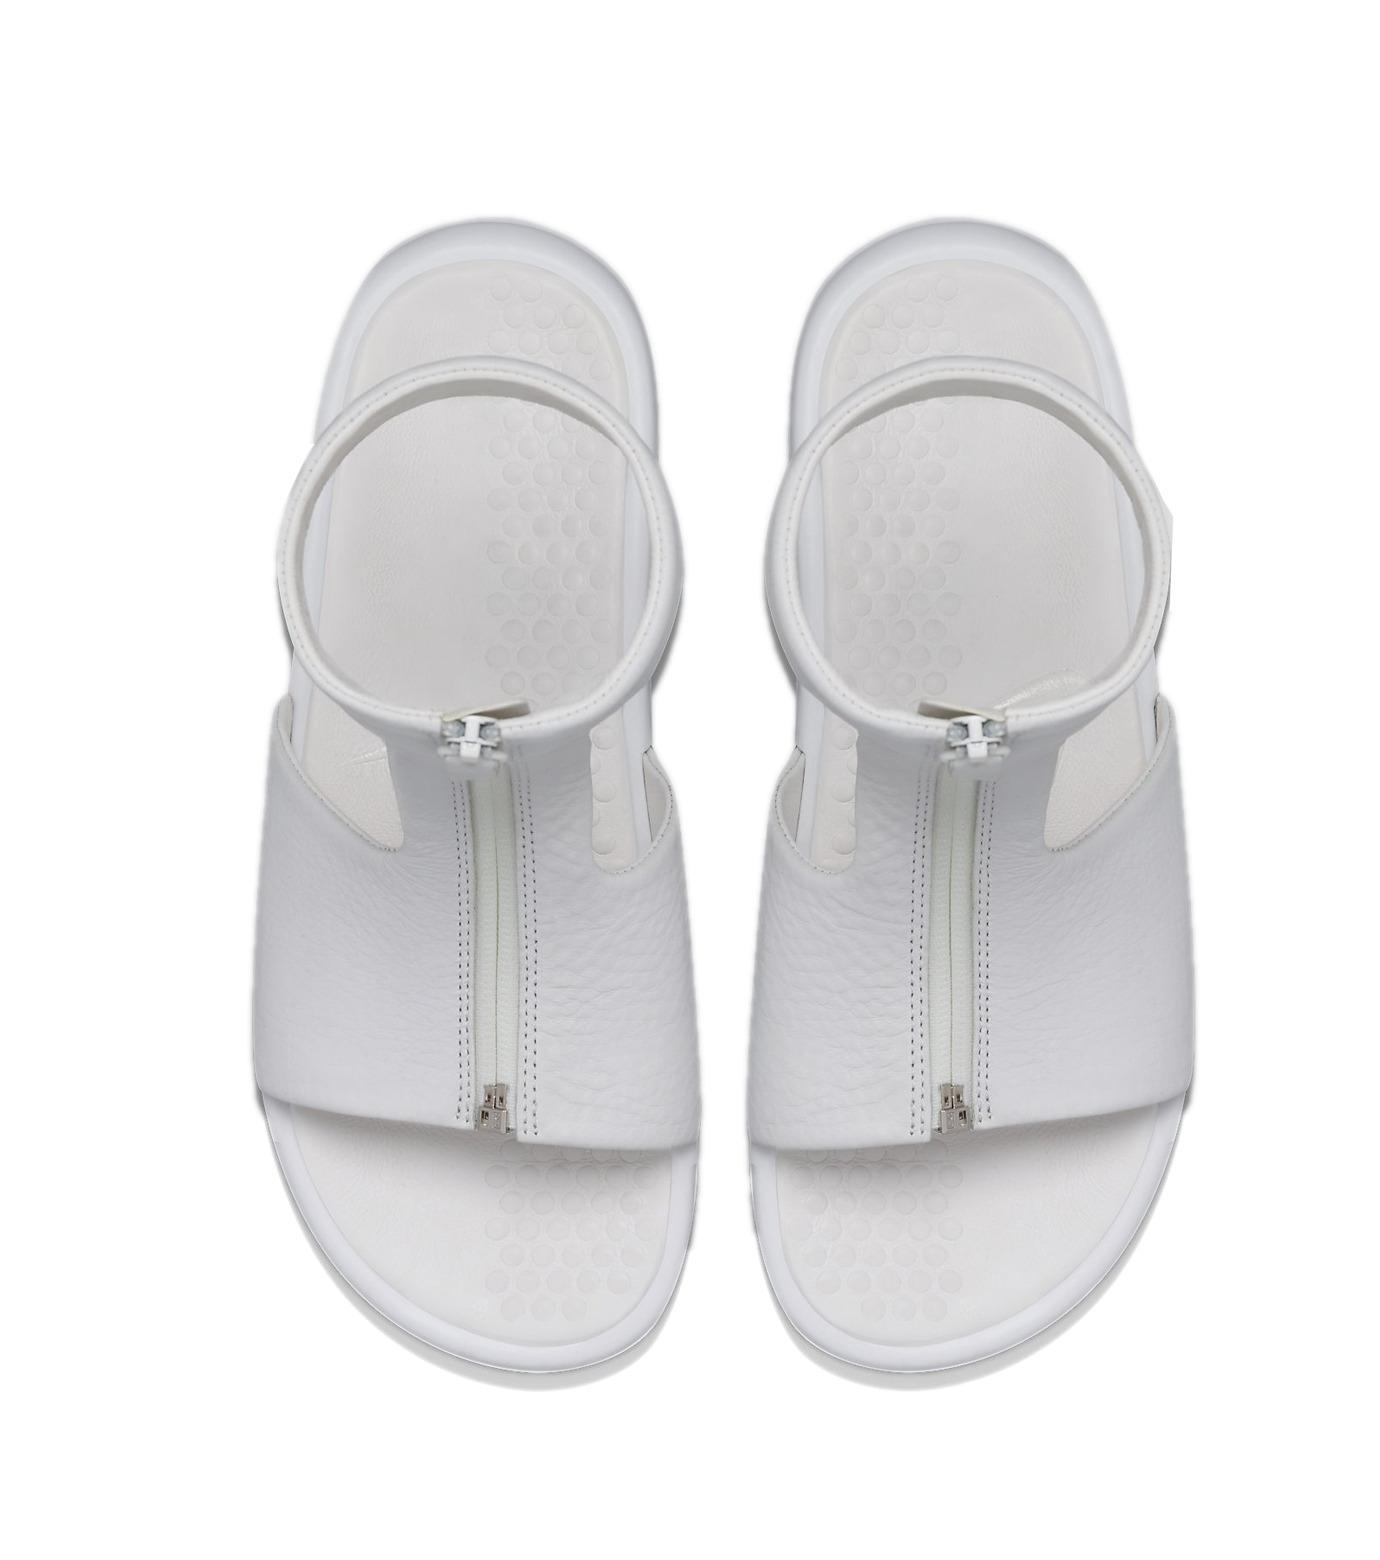 NIKE(ナイキ)のBenassi CUFF-WHITE(シューズ/shoes)-819684-100-4 拡大詳細画像4